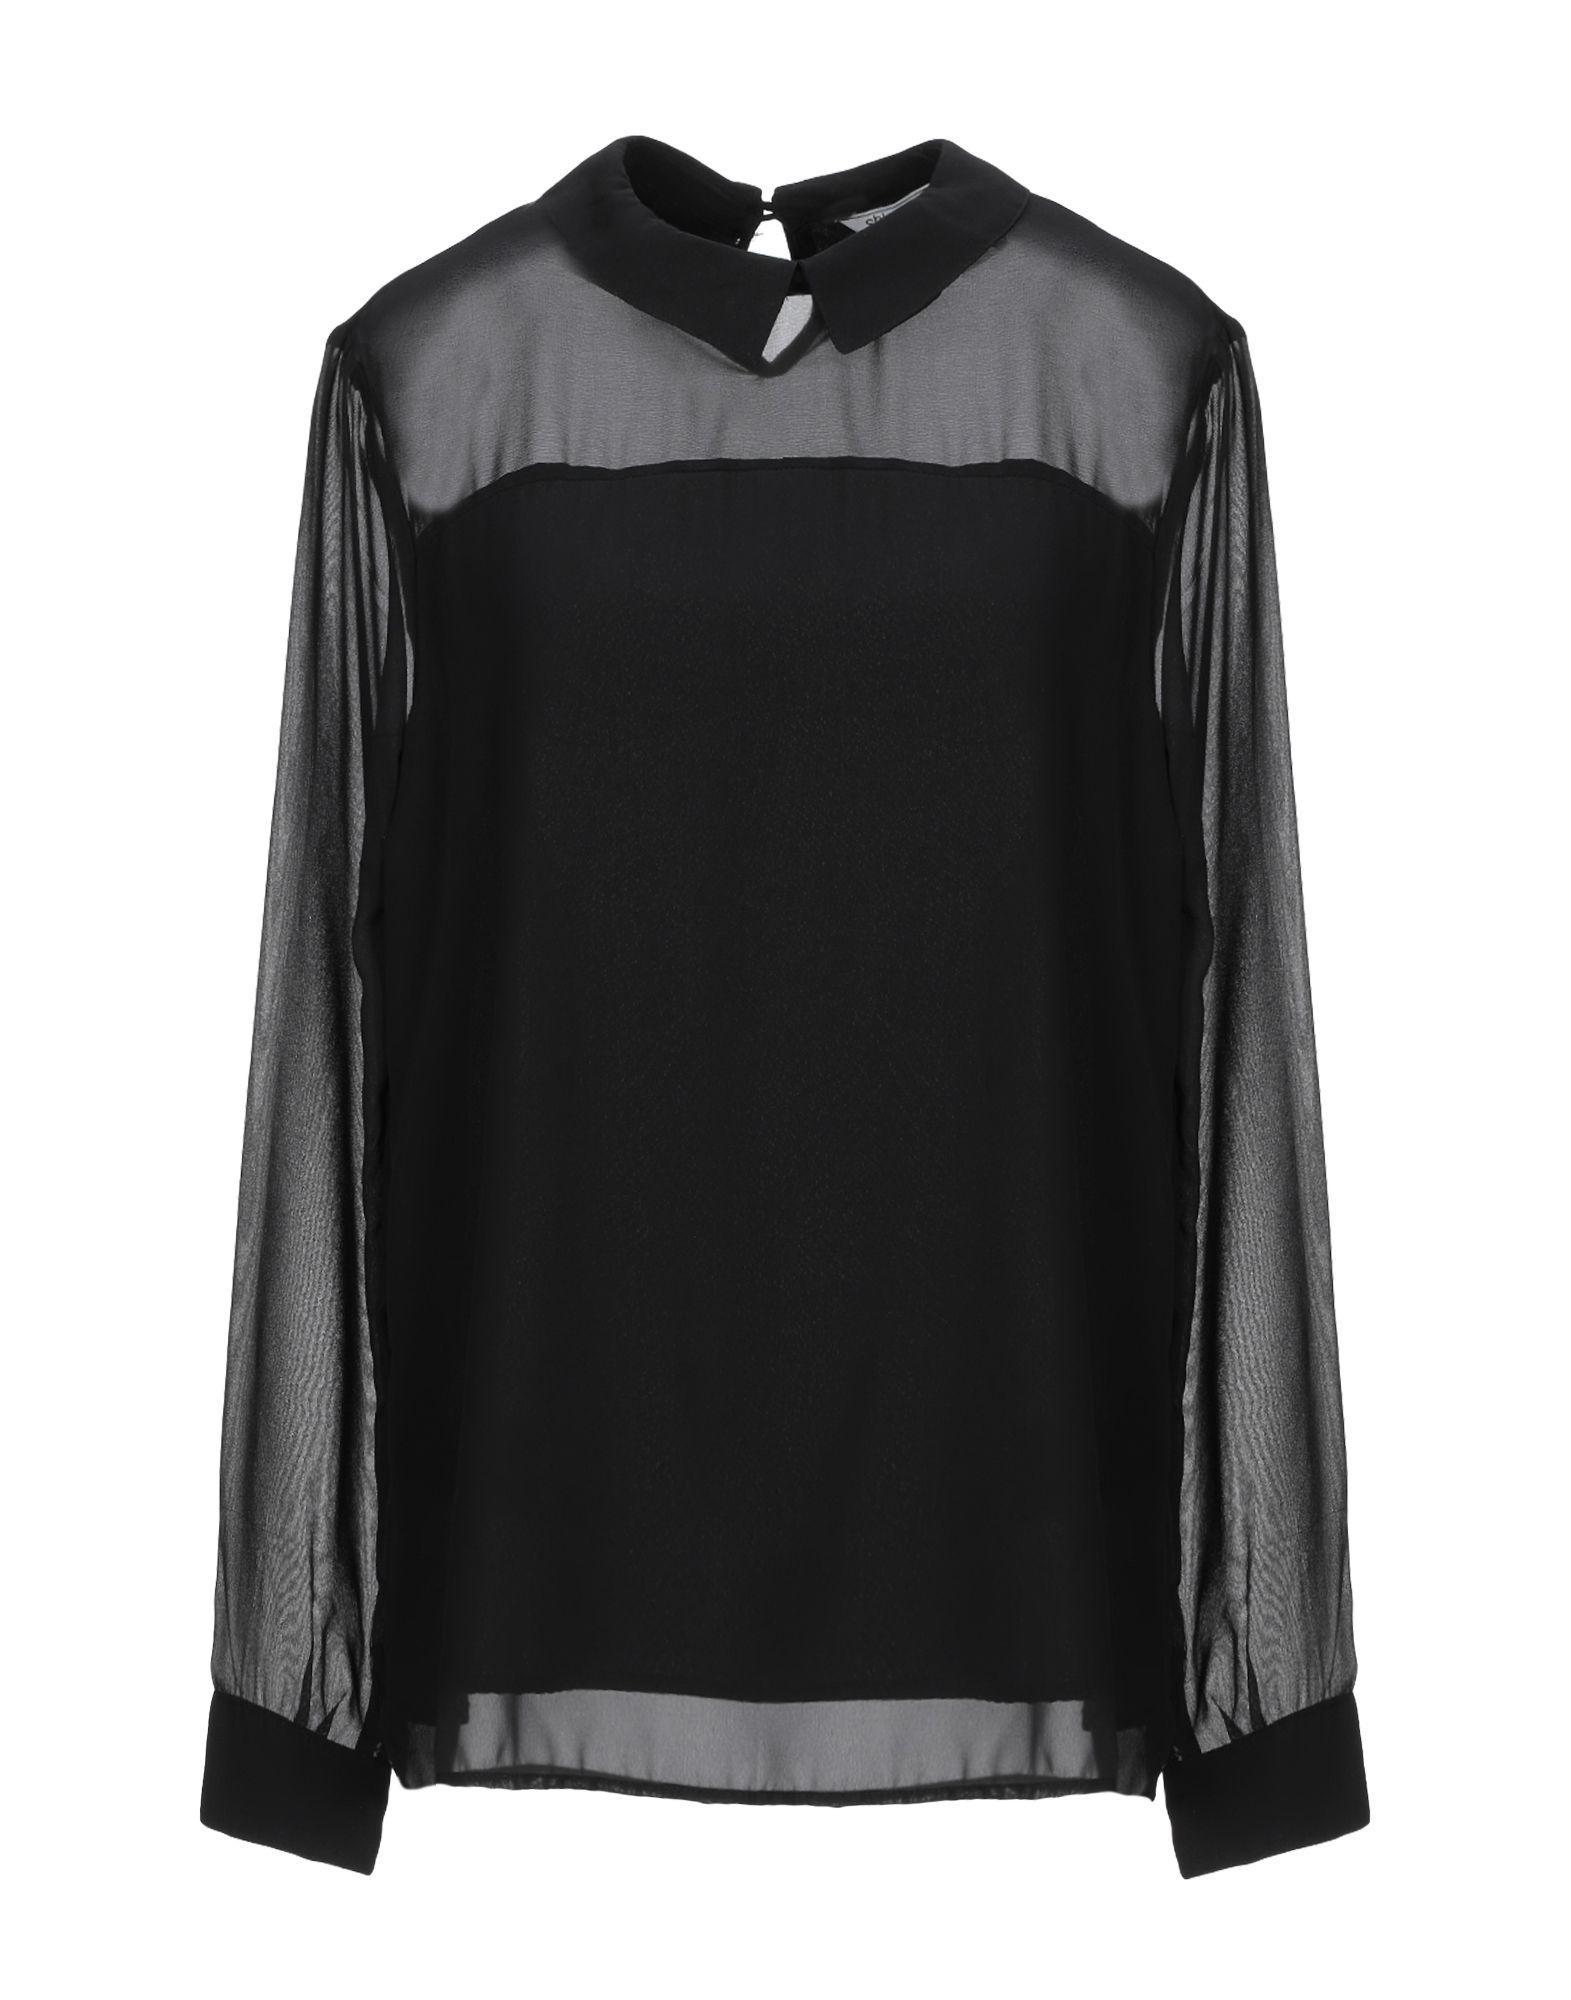 SH by SILVIAN HEACH Блузка блузка женская silvian heach benifato цвет черный синий pga18120bl black navy размер l 46